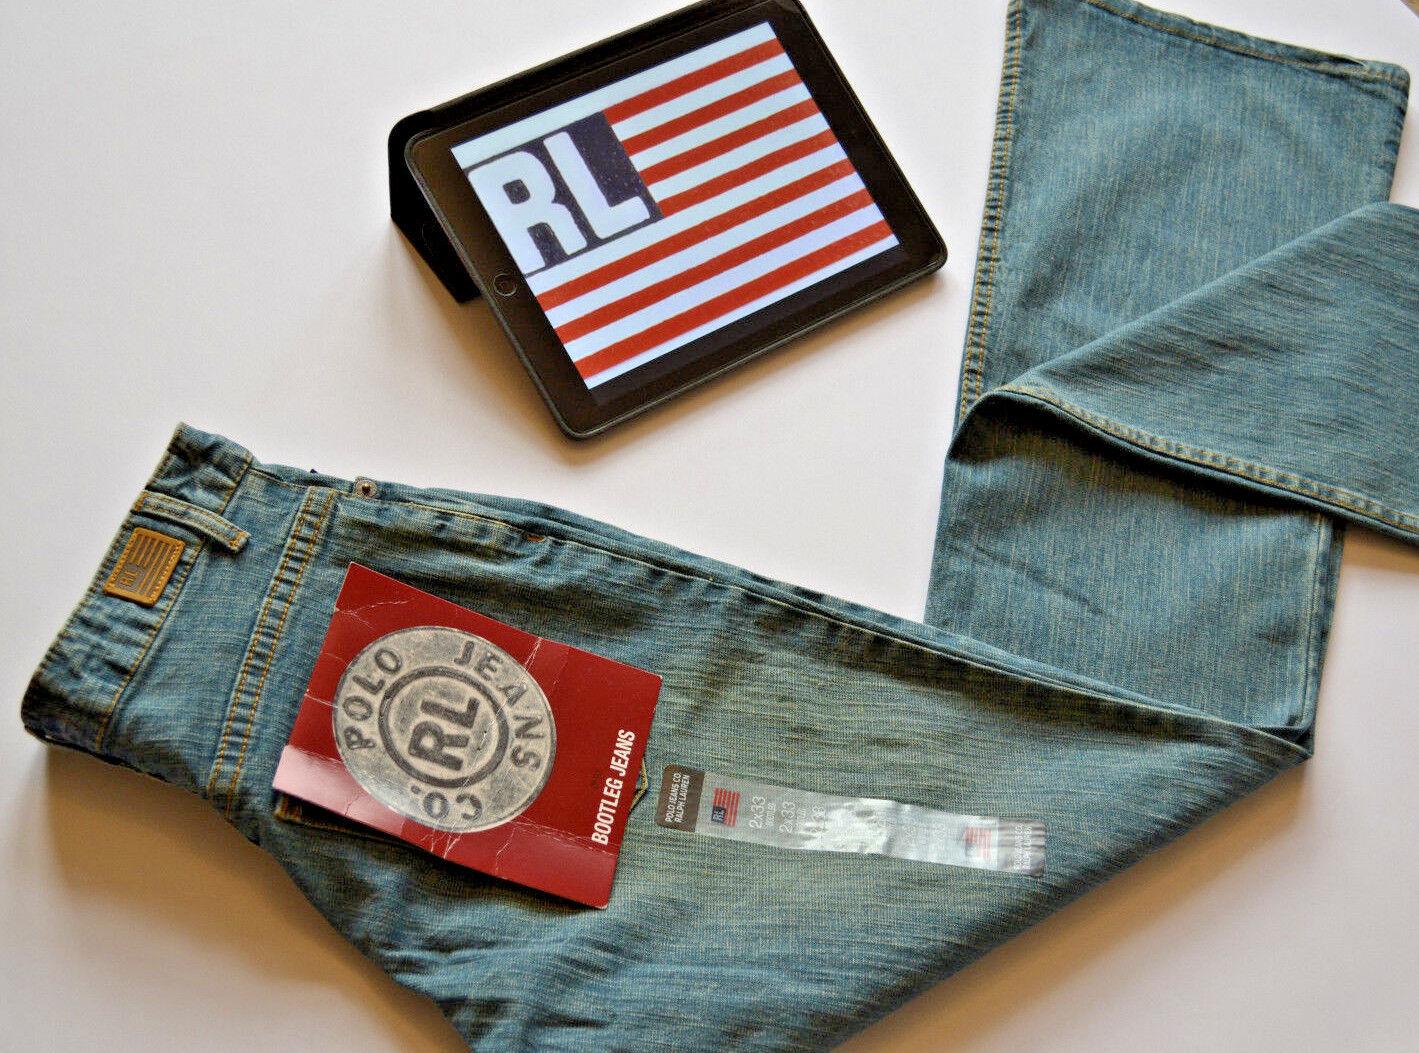 Ralph Lauren Polo Womens Jeans Retro Bootleg Old bluee W27 L33